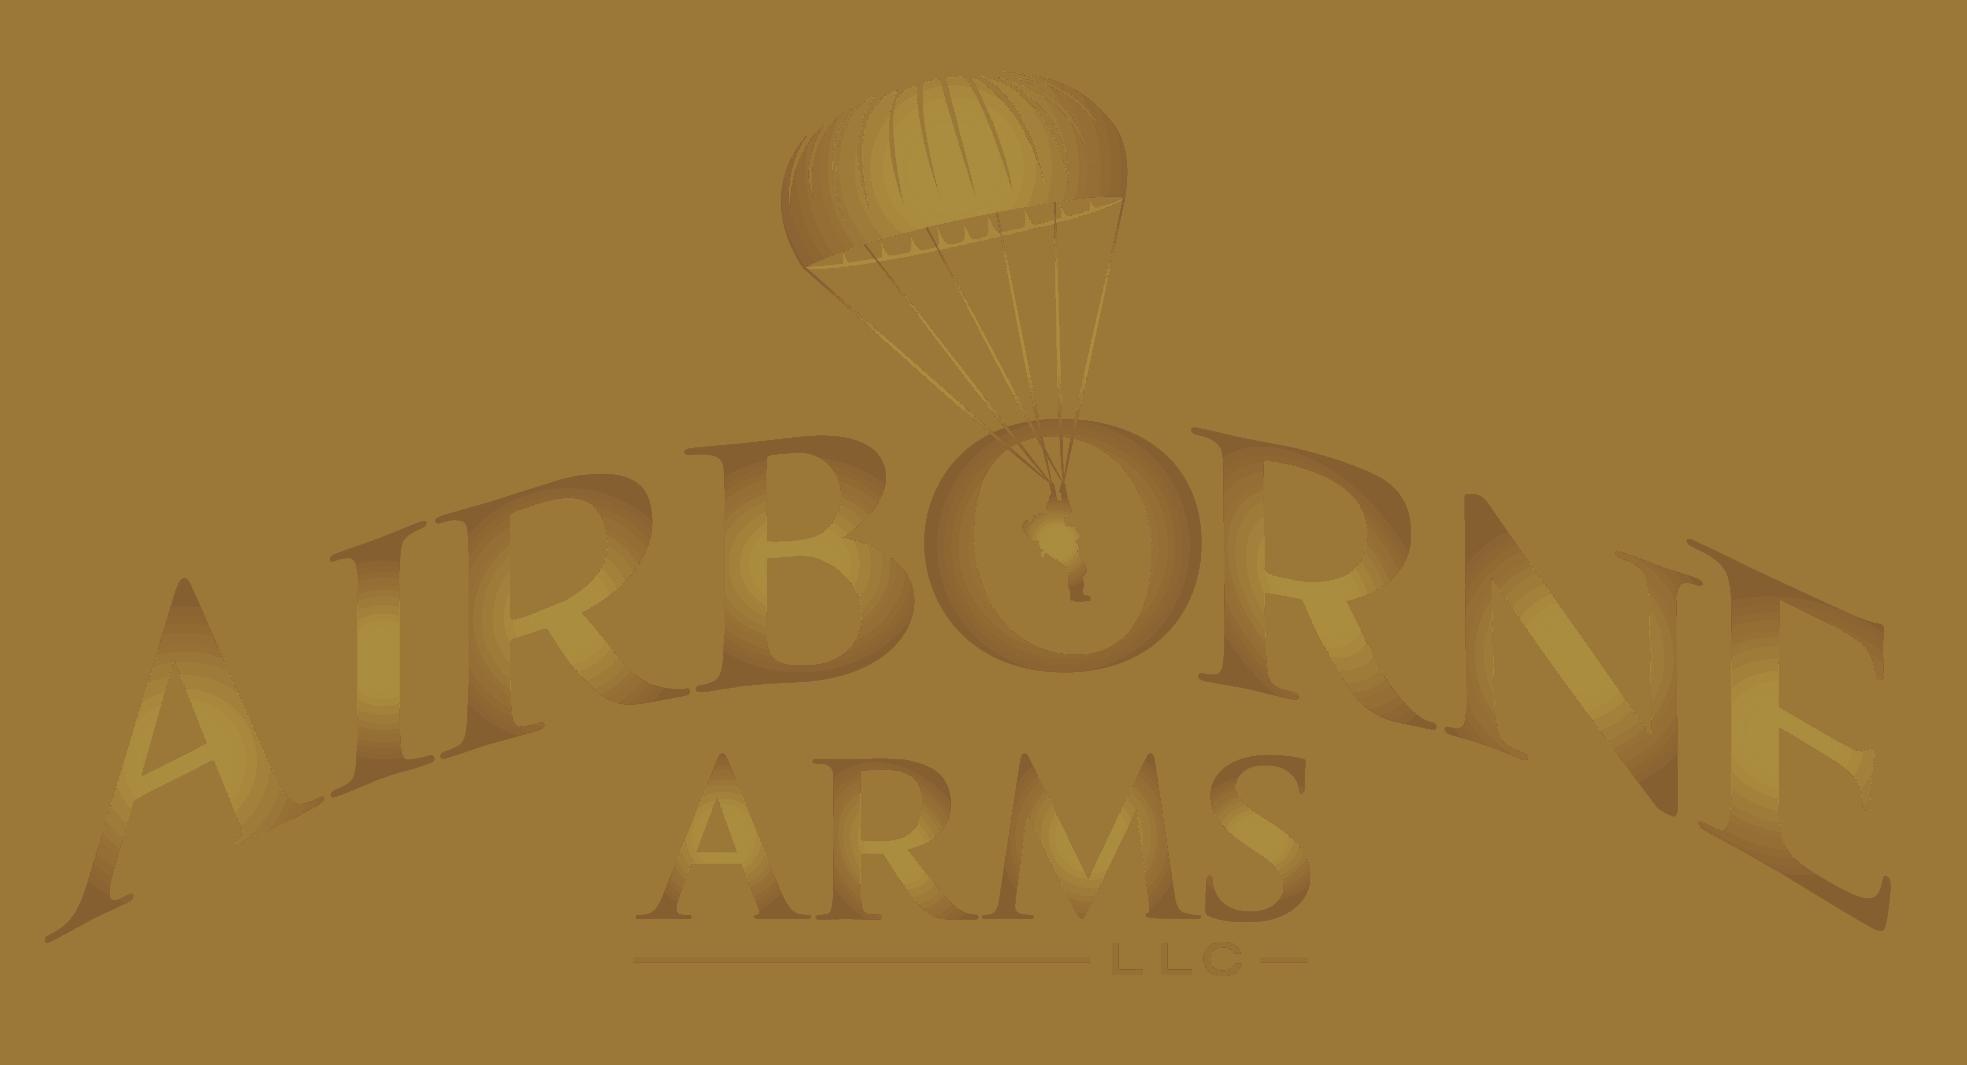 Airborne Arms LLC